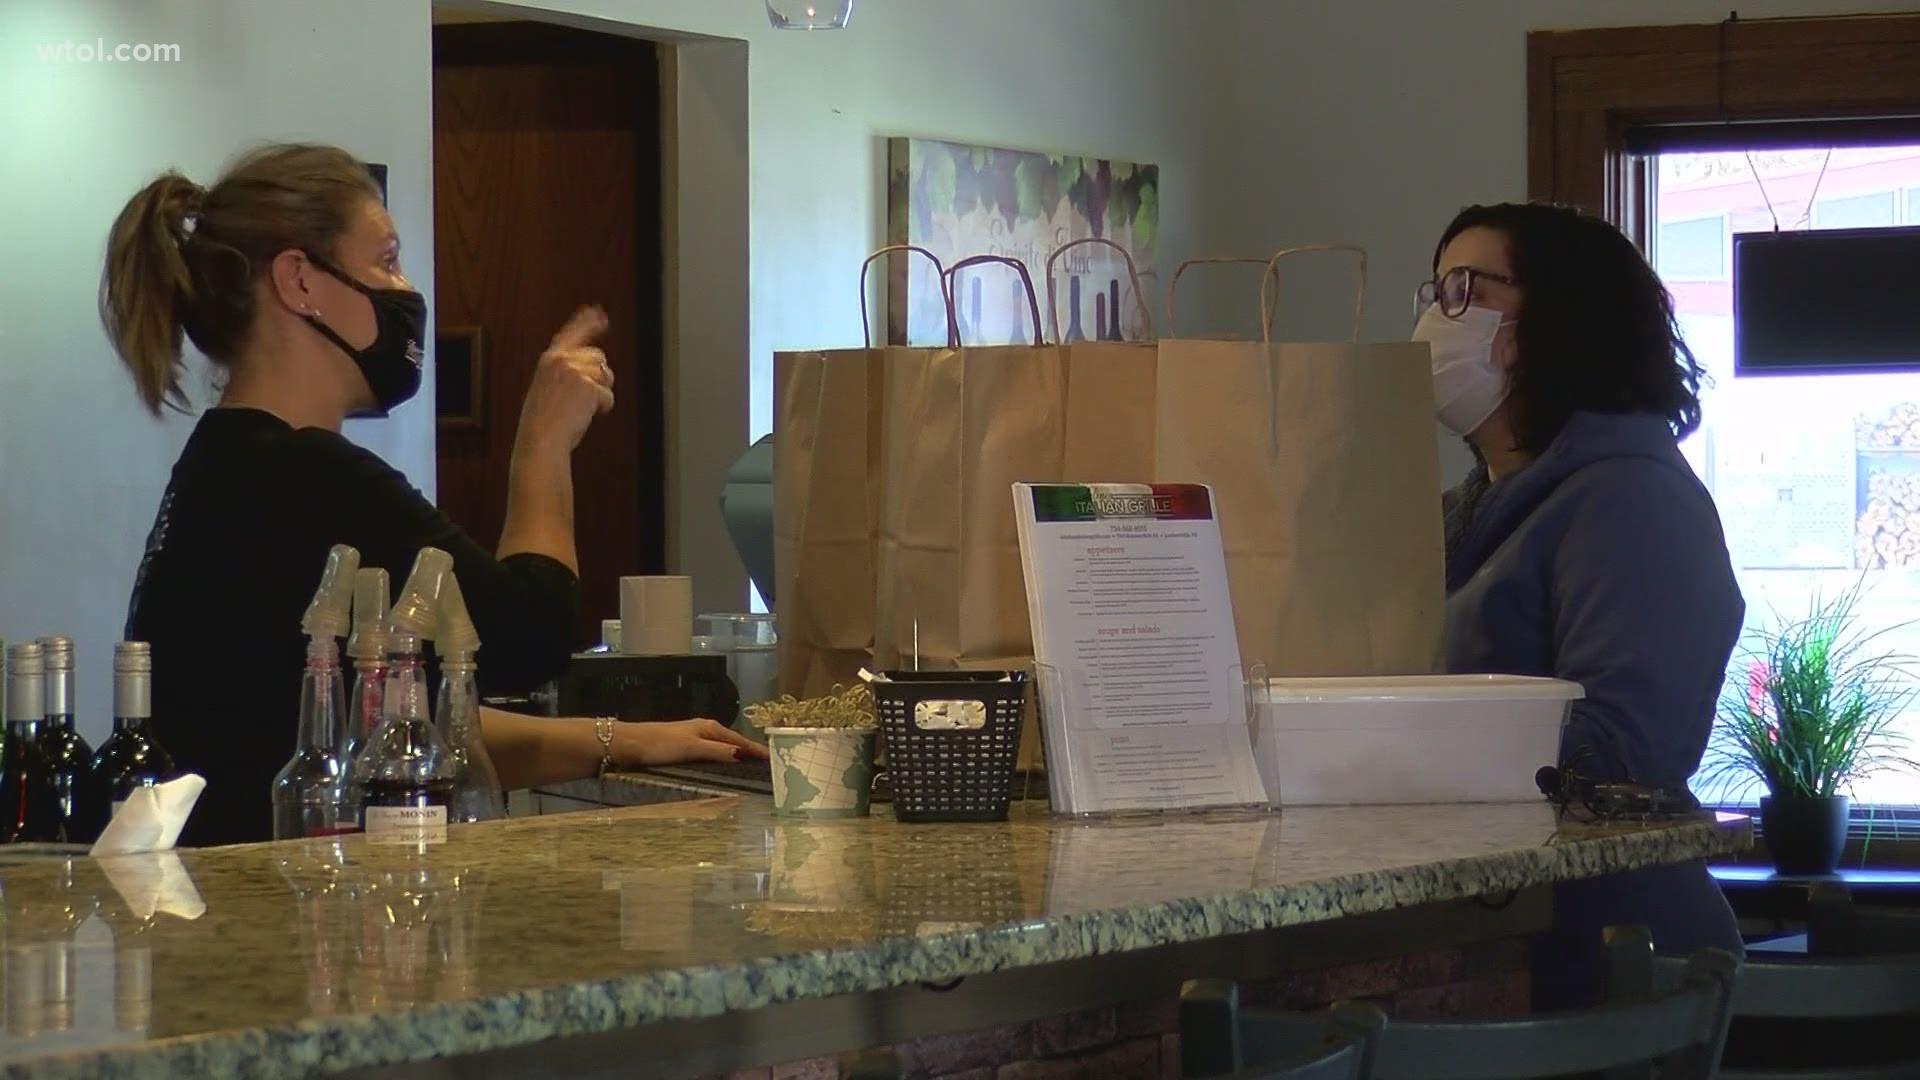 Michigan Restaurants Adjust To New Covid 19 Restrictions Wtol Com